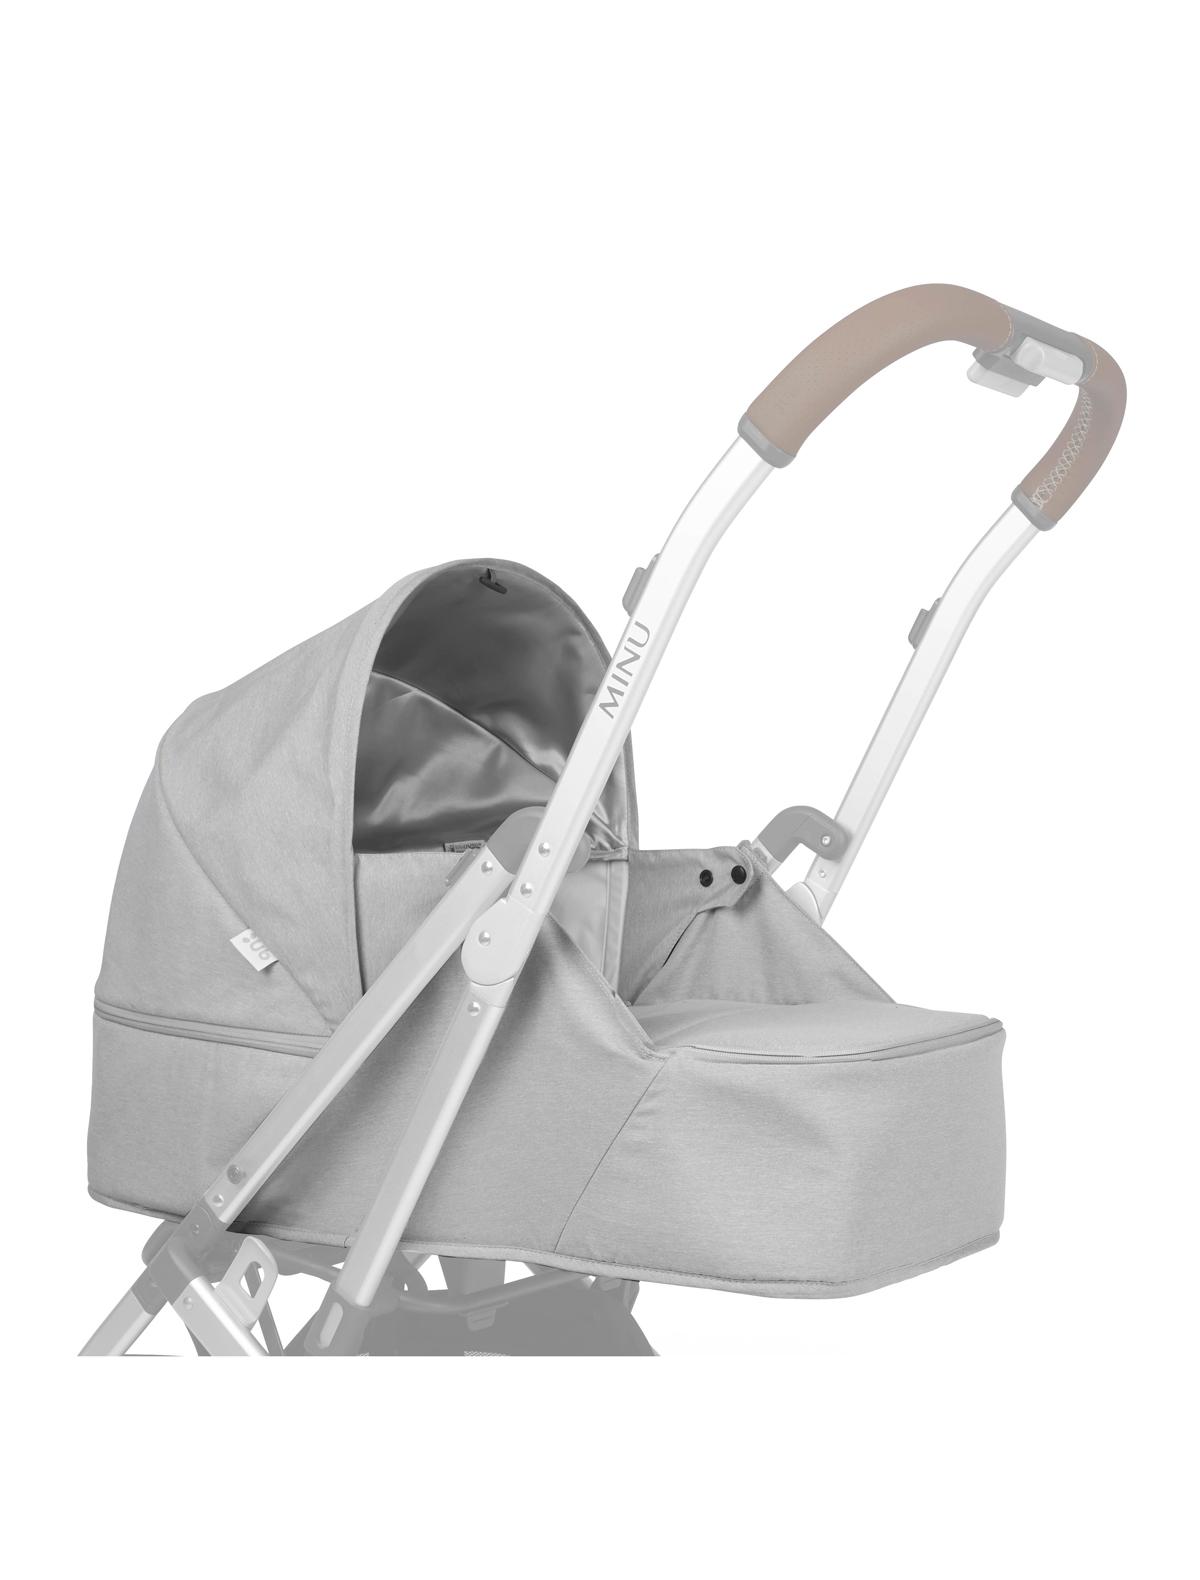 Аксессуар для коляски UPPAbaby 2152442 серого цвета